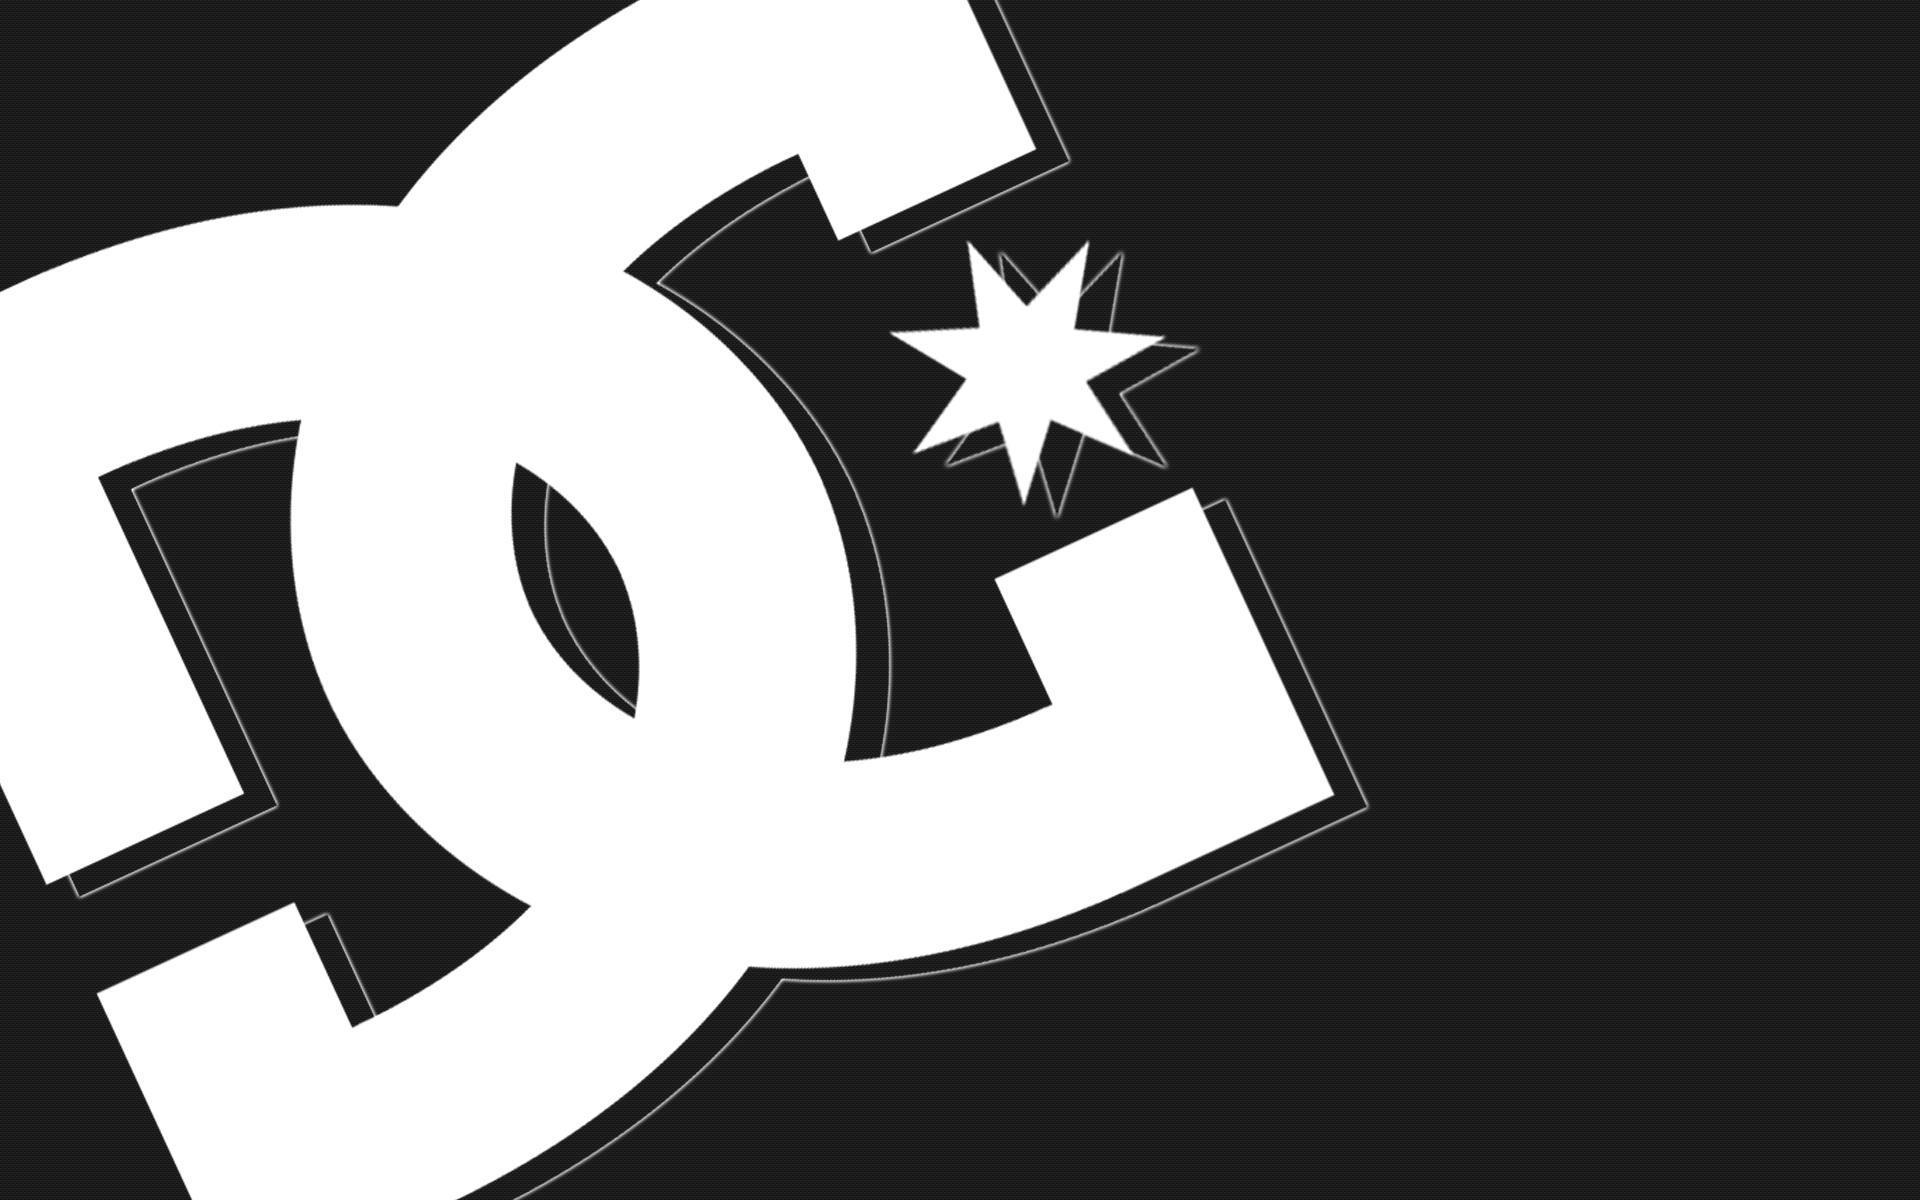 76+] Dc Shoes Logo Wallpaper on WallpaperSafari.